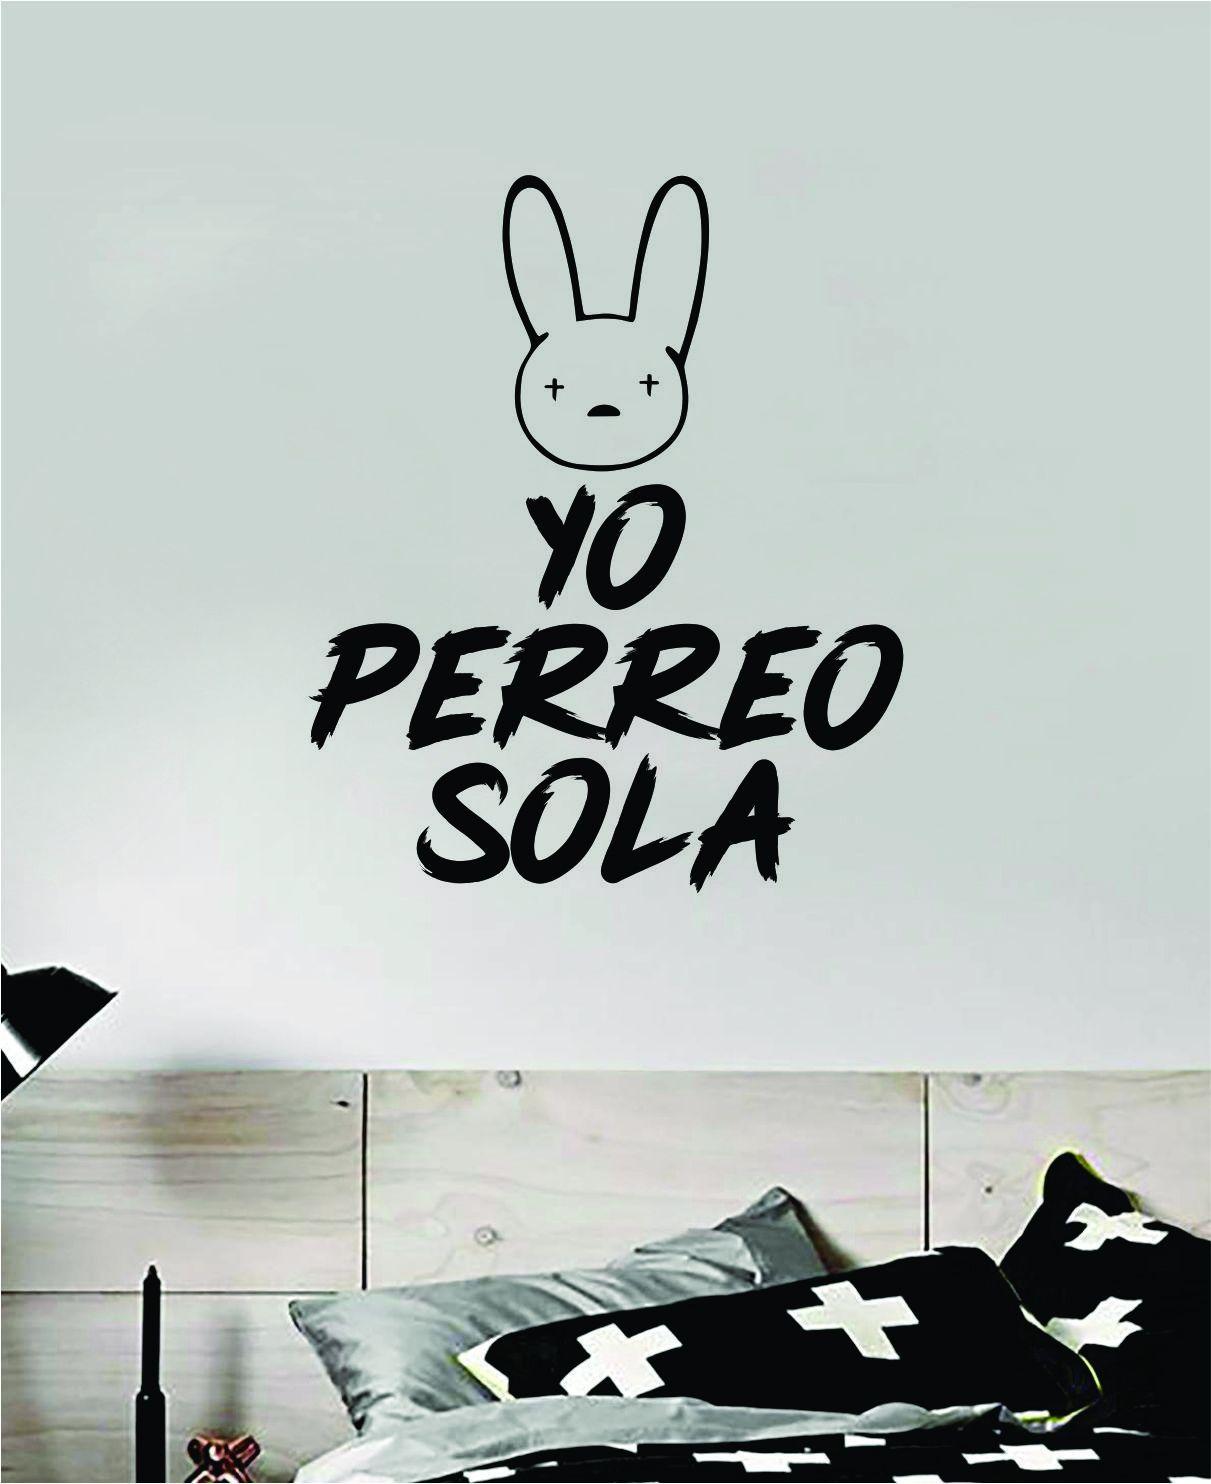 Bad Bunny Yo Perreo Sola YHLQMDLG Wall Decal Home Decor Sticker Vinyl Bedroom Room Quote Spanish Music Reggaeton Girls Funny Teen Lyrics - green